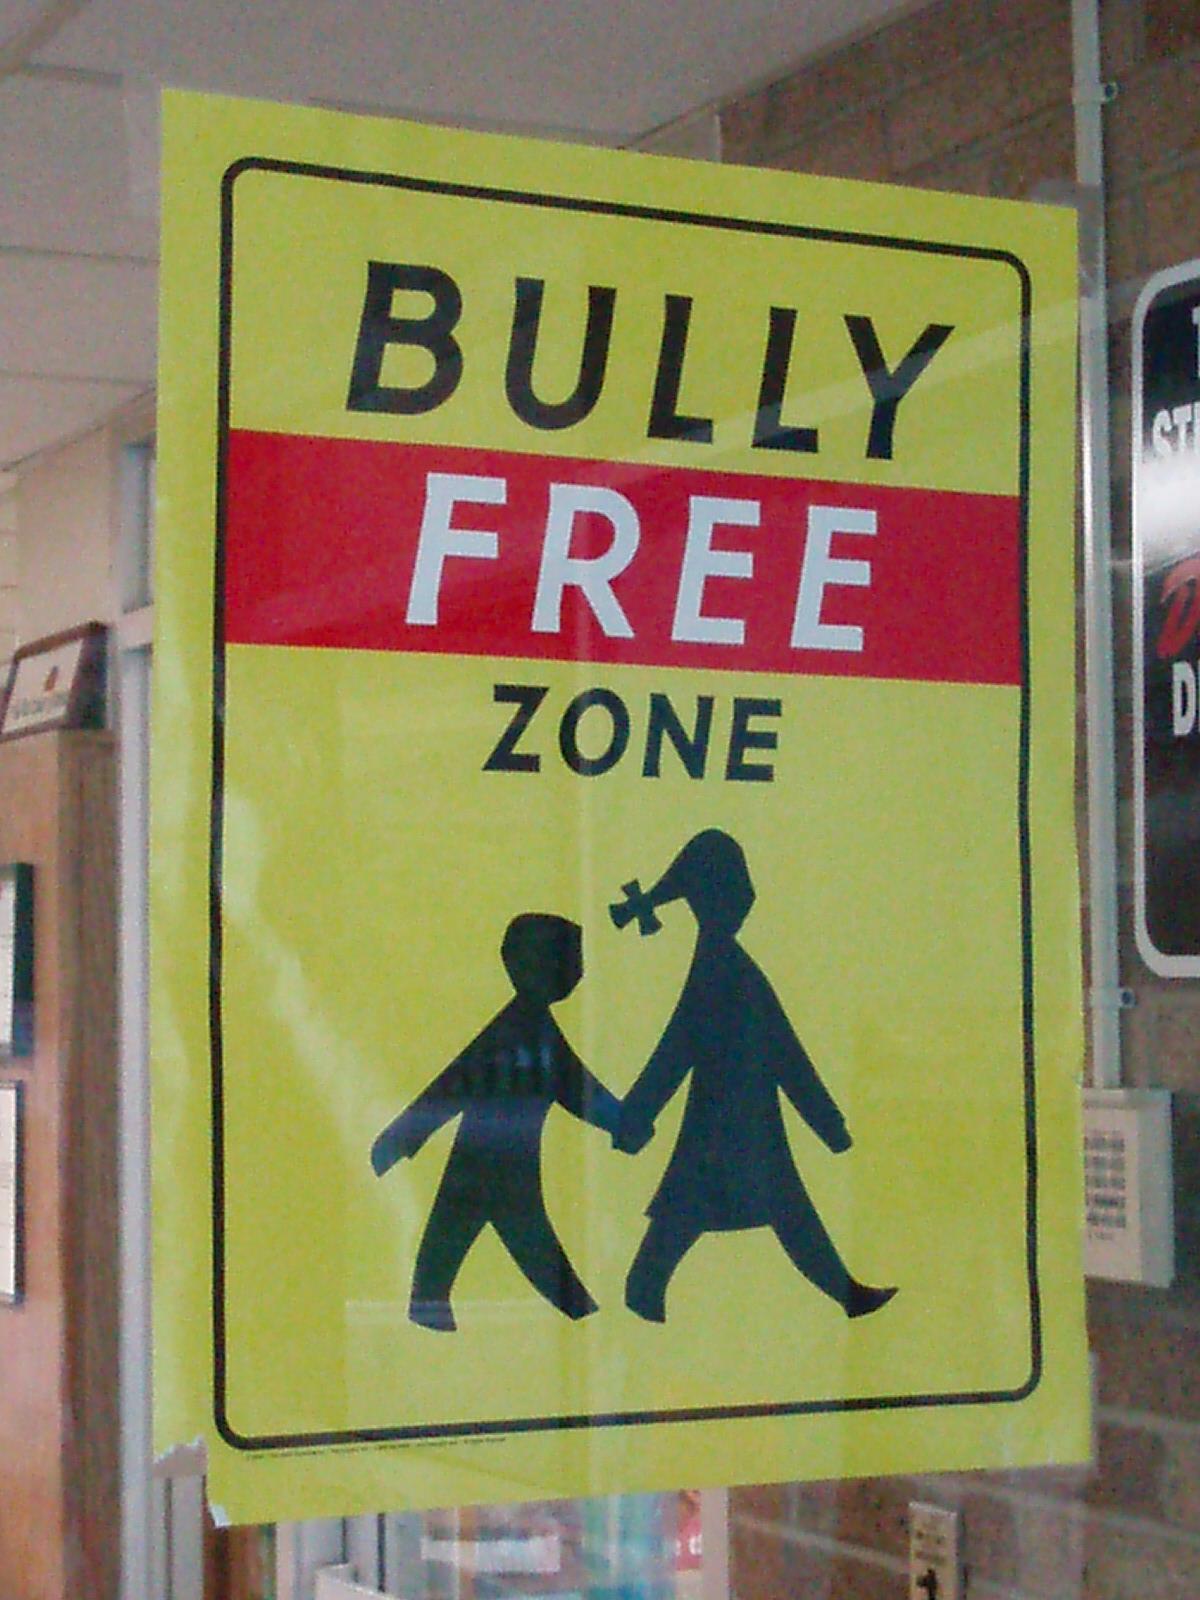 anti bullying month, bullies, bullying, bullying month, what is bullying, october bullying month, pacer, PACER's National Center for Bullying Prevention, mike s robinson, michael robinson, mike robinson, am970, michael s robinson, how to stop bullying, how to stop a bully, what is a bully, how to identify a bull, anti bullying month nyc, anti bullying month ny,